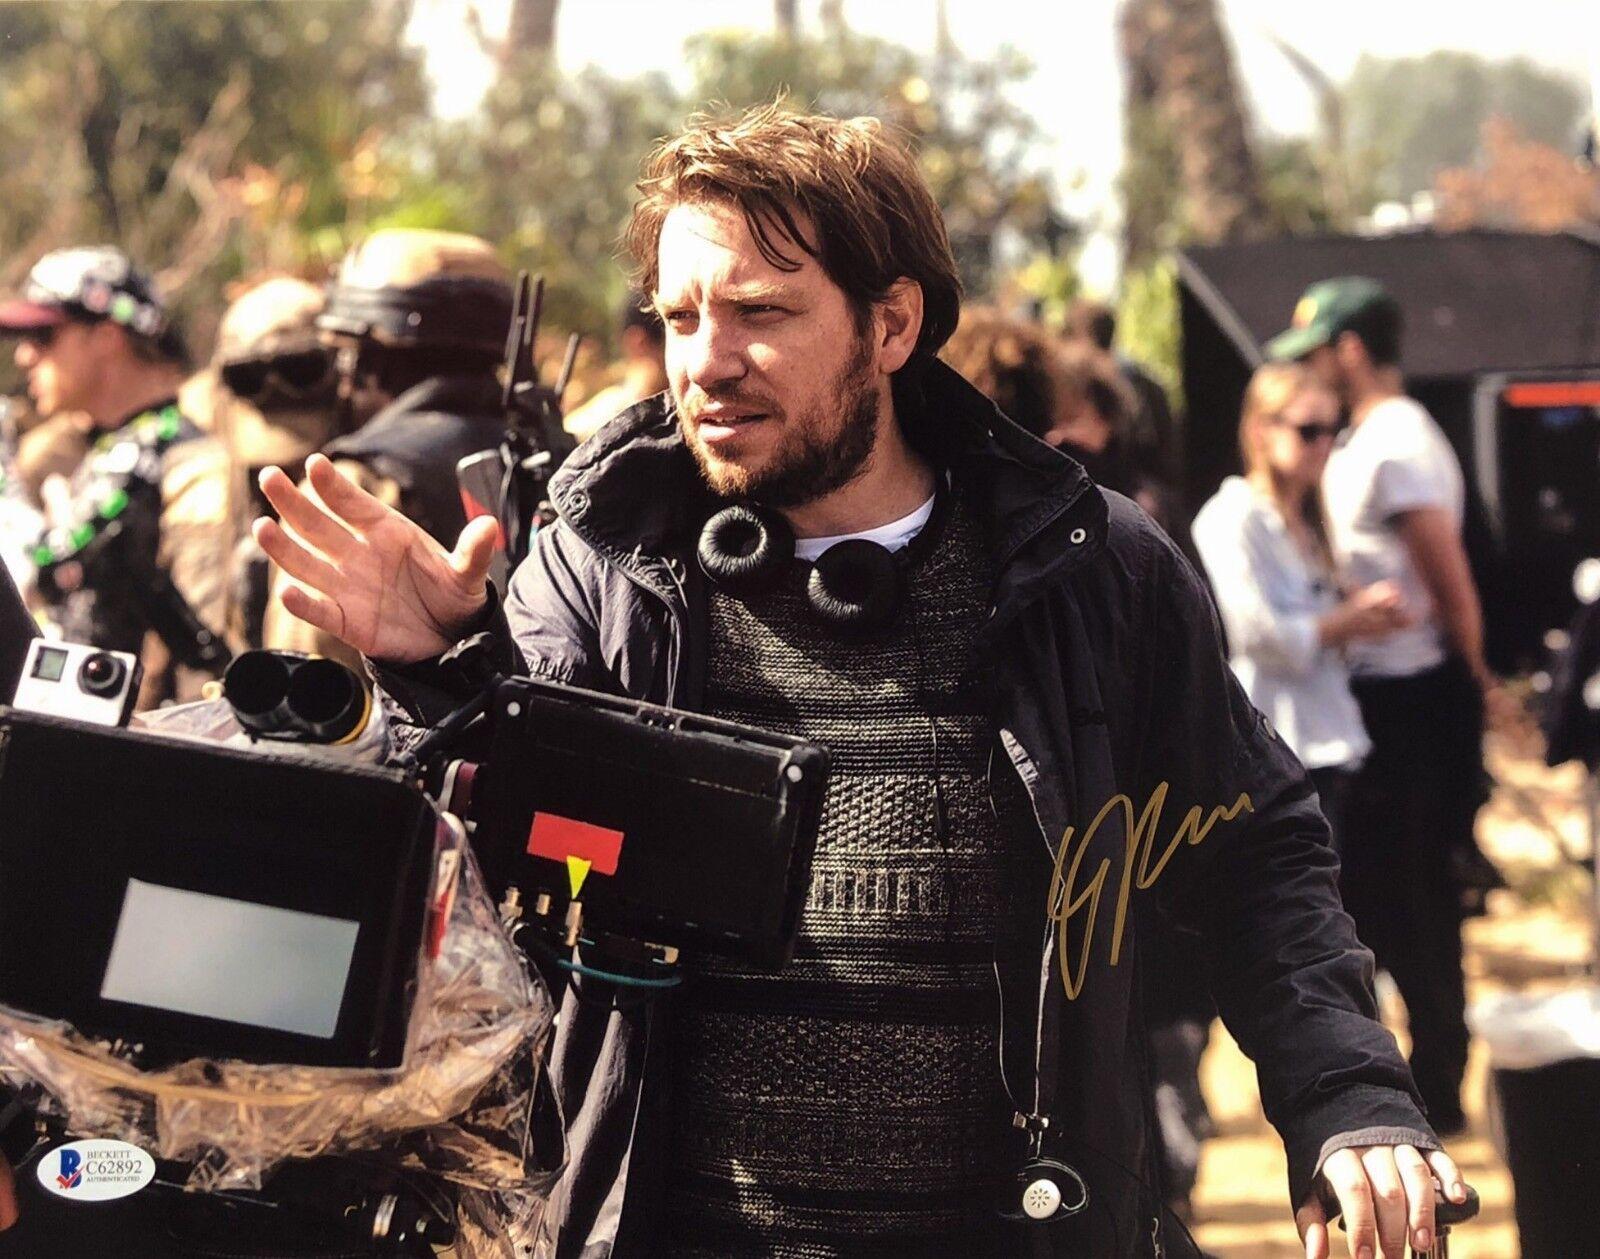 Gareth Edwards Signed Star Wars 'Rogue One' 11x14 Photo Beckett BAS C62892